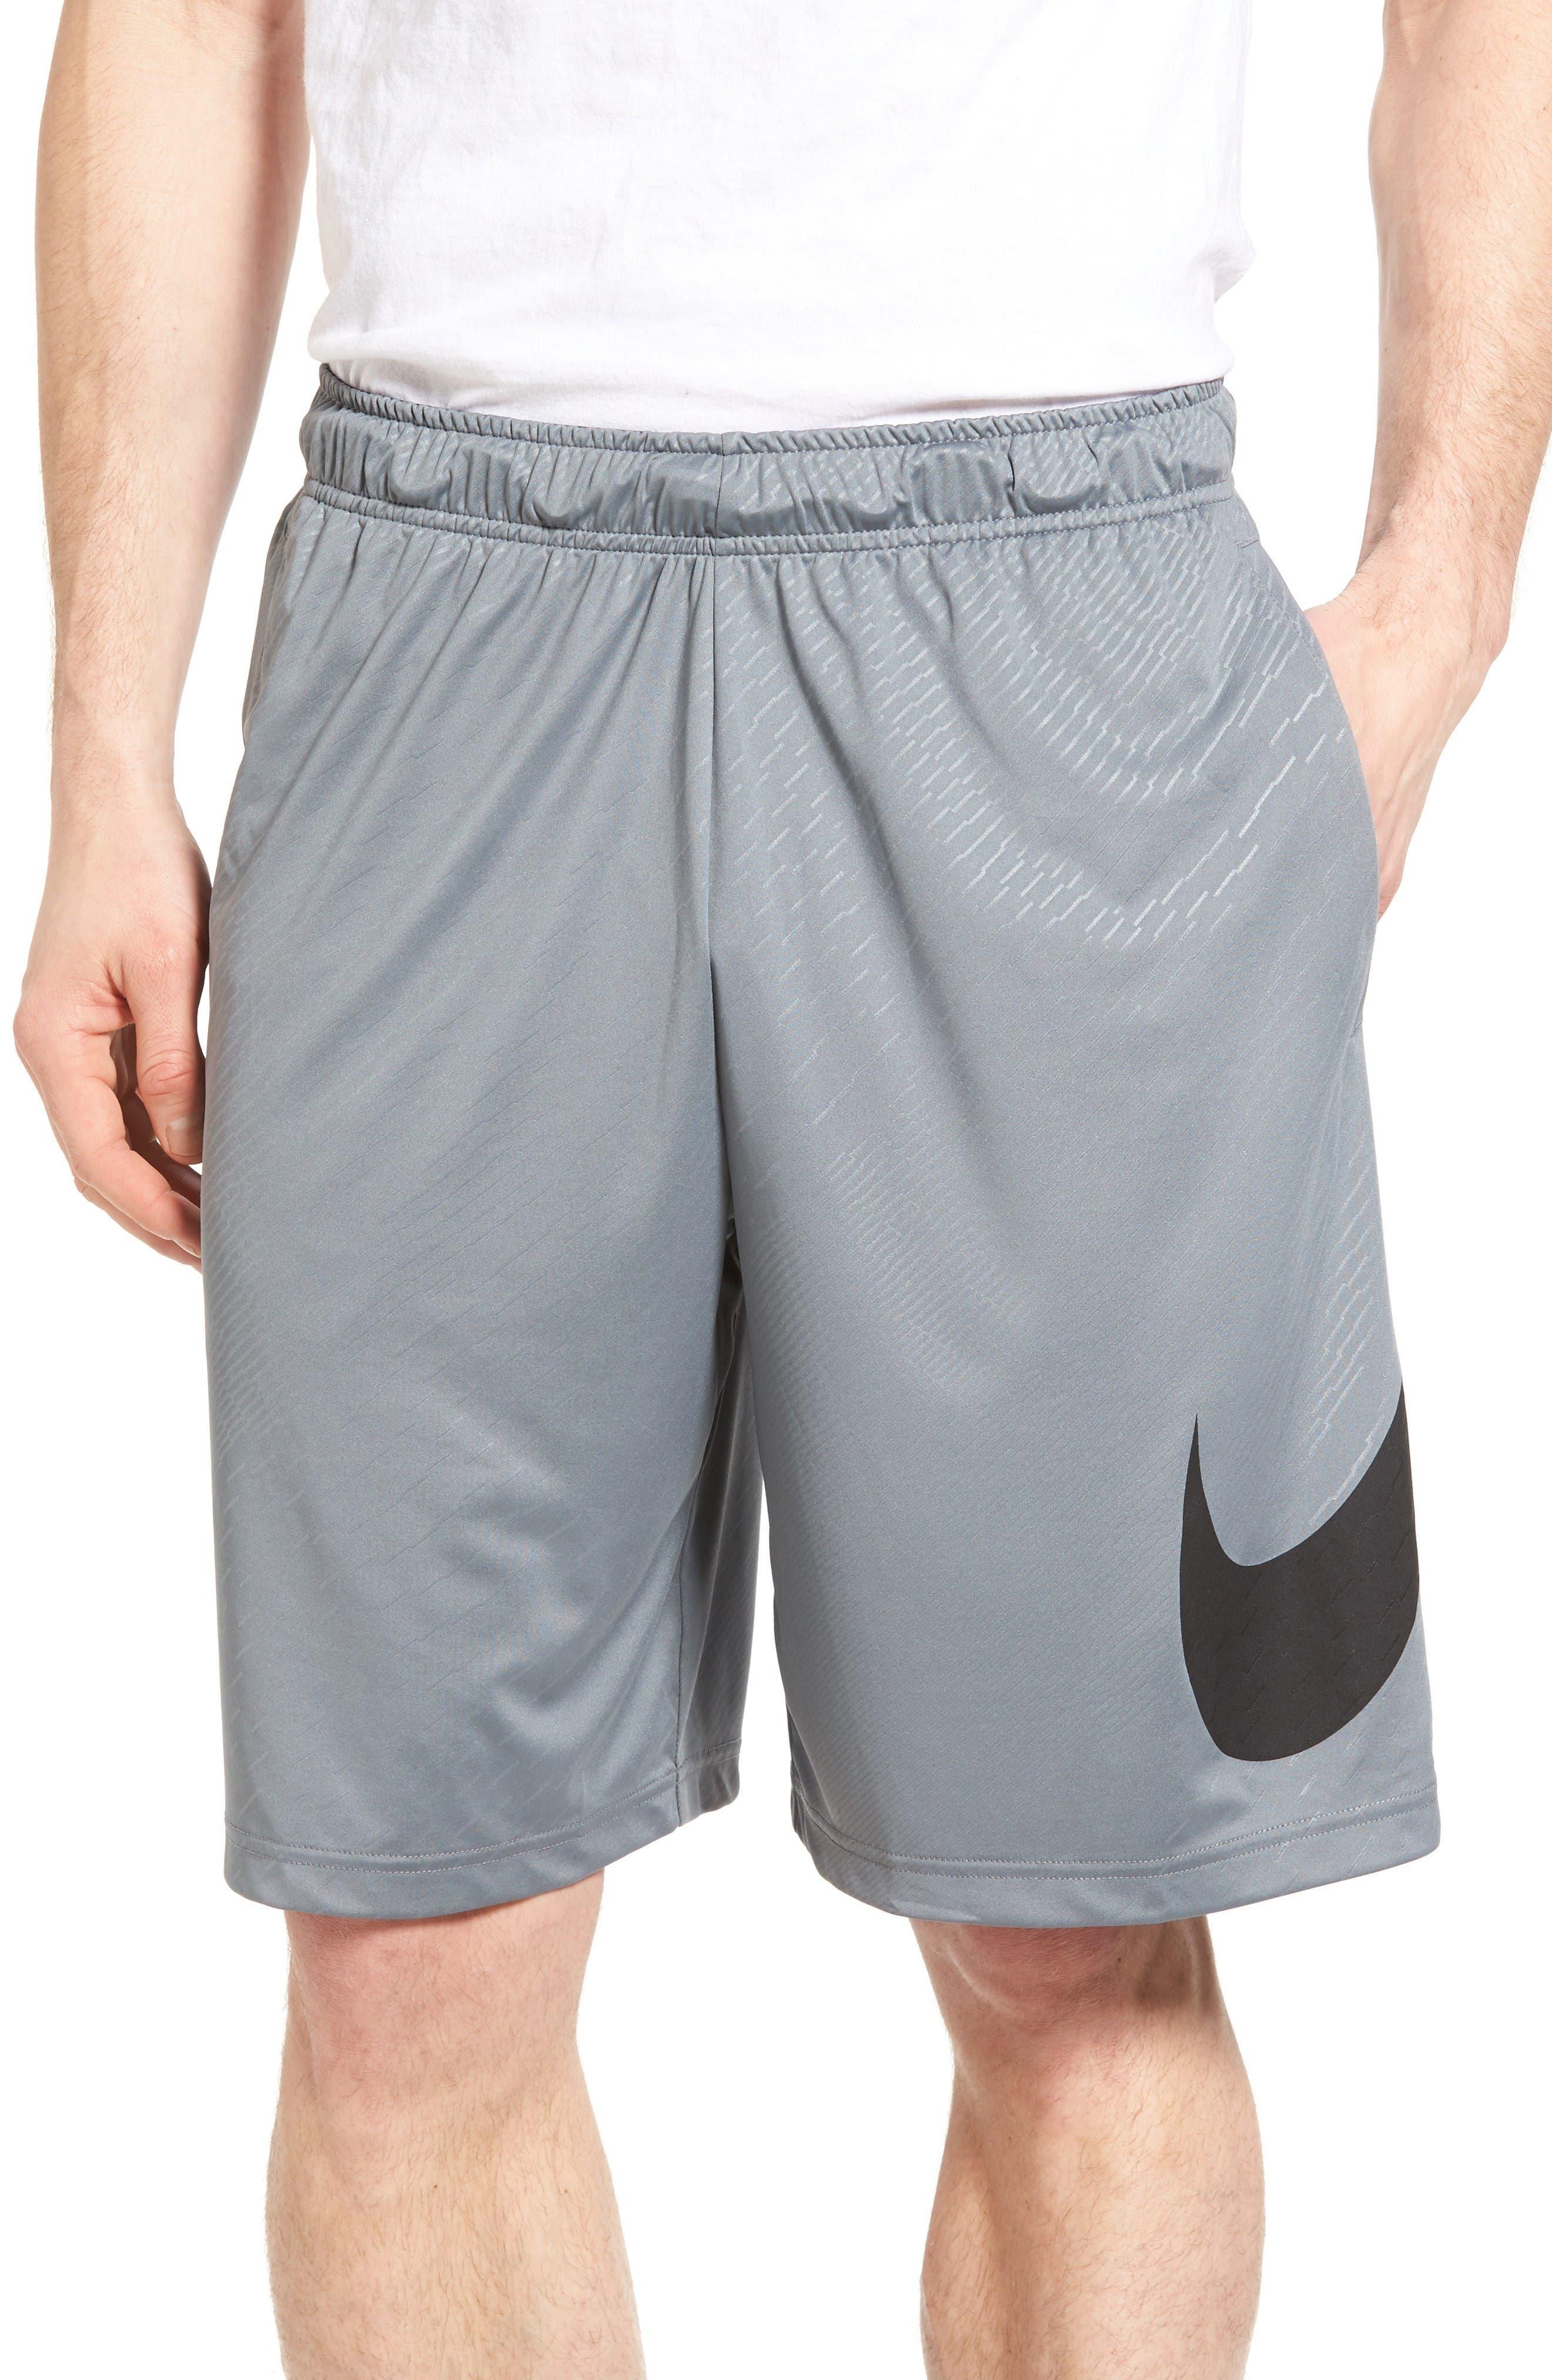 Dry Training Shorts,                         Main,                         color, Cool Grey/ Black